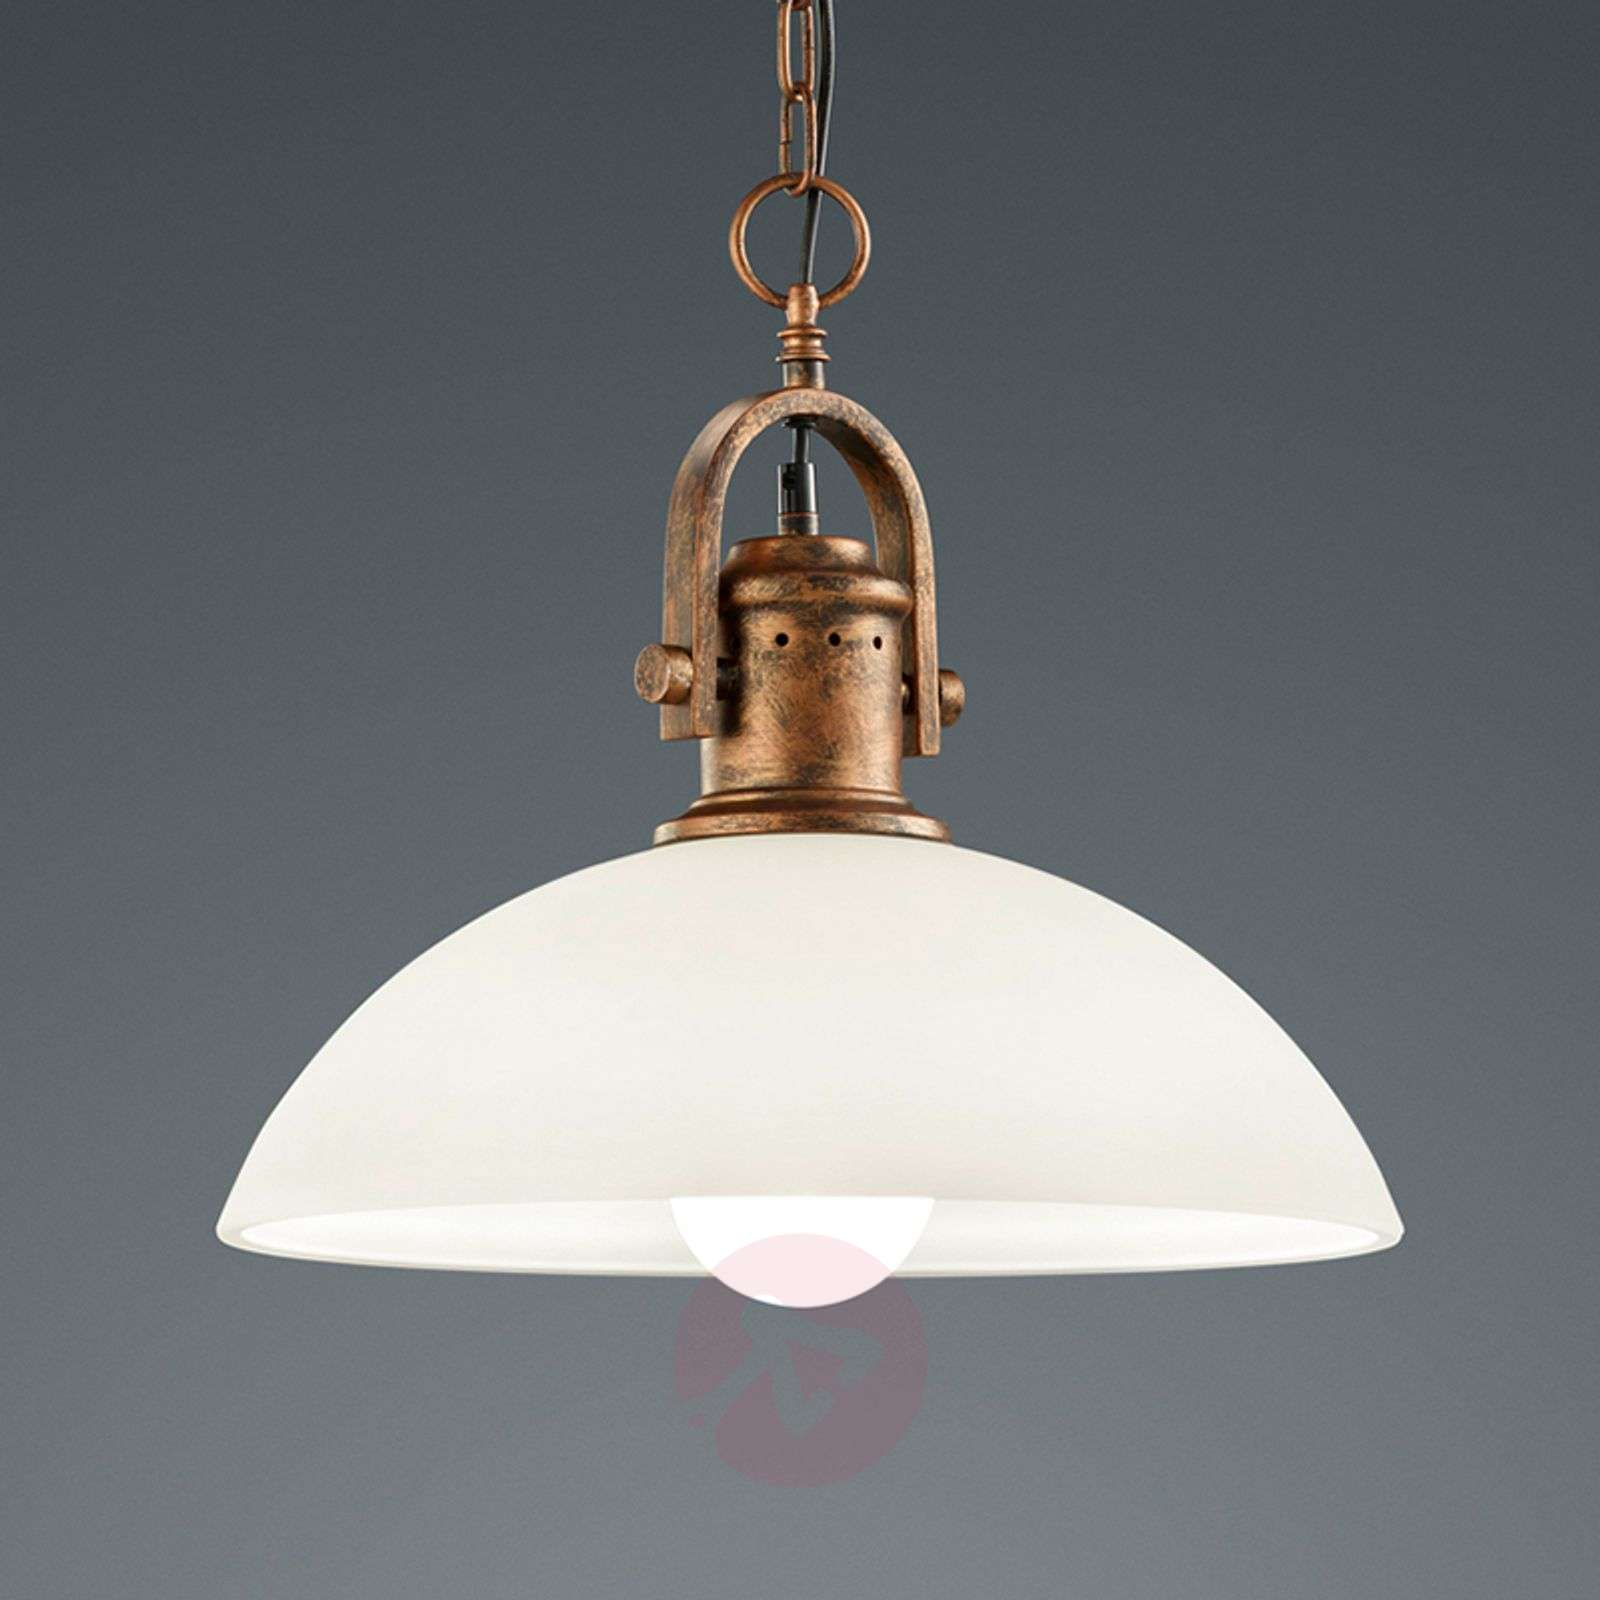 antique pendant lights. Impressive Pendant Lamp Montender, Antique Copper-9005209-01 Lights